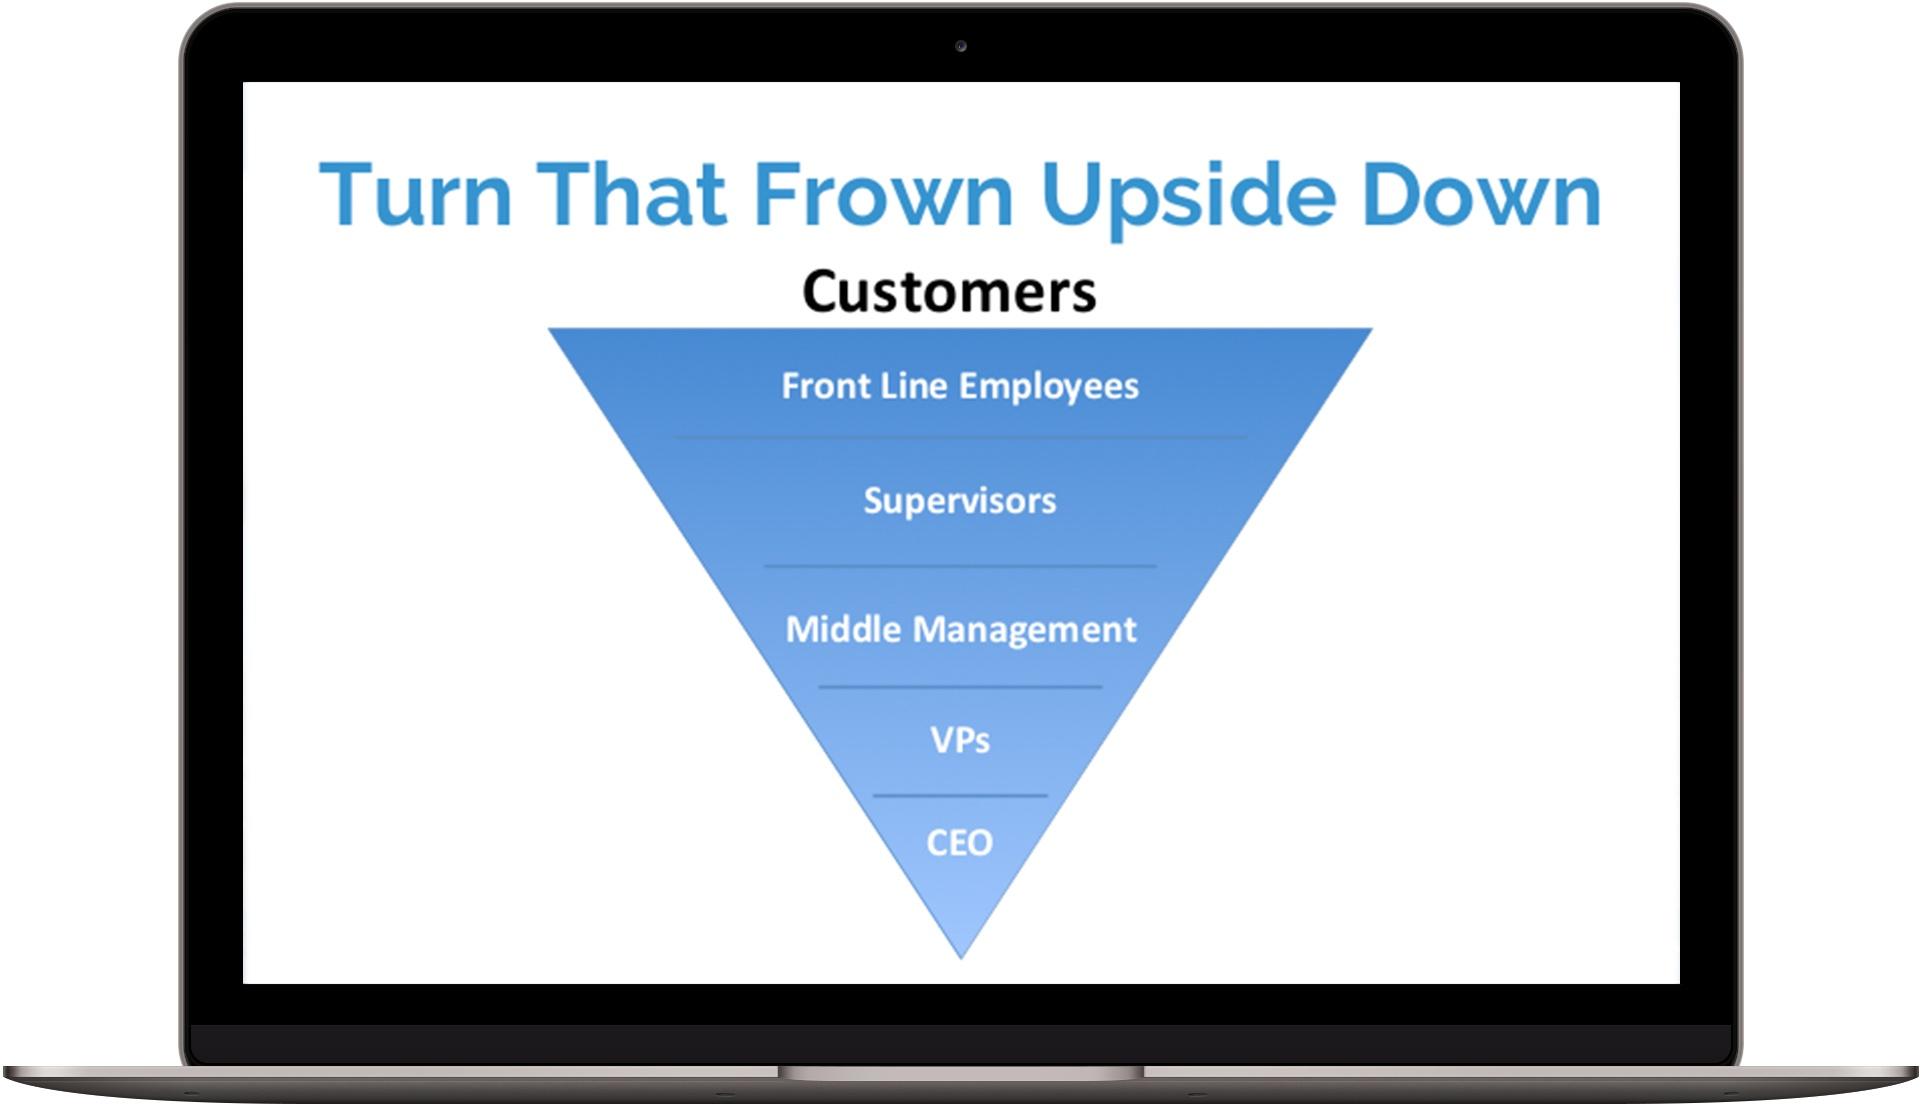 Bottom Up Improvement Image.jpg